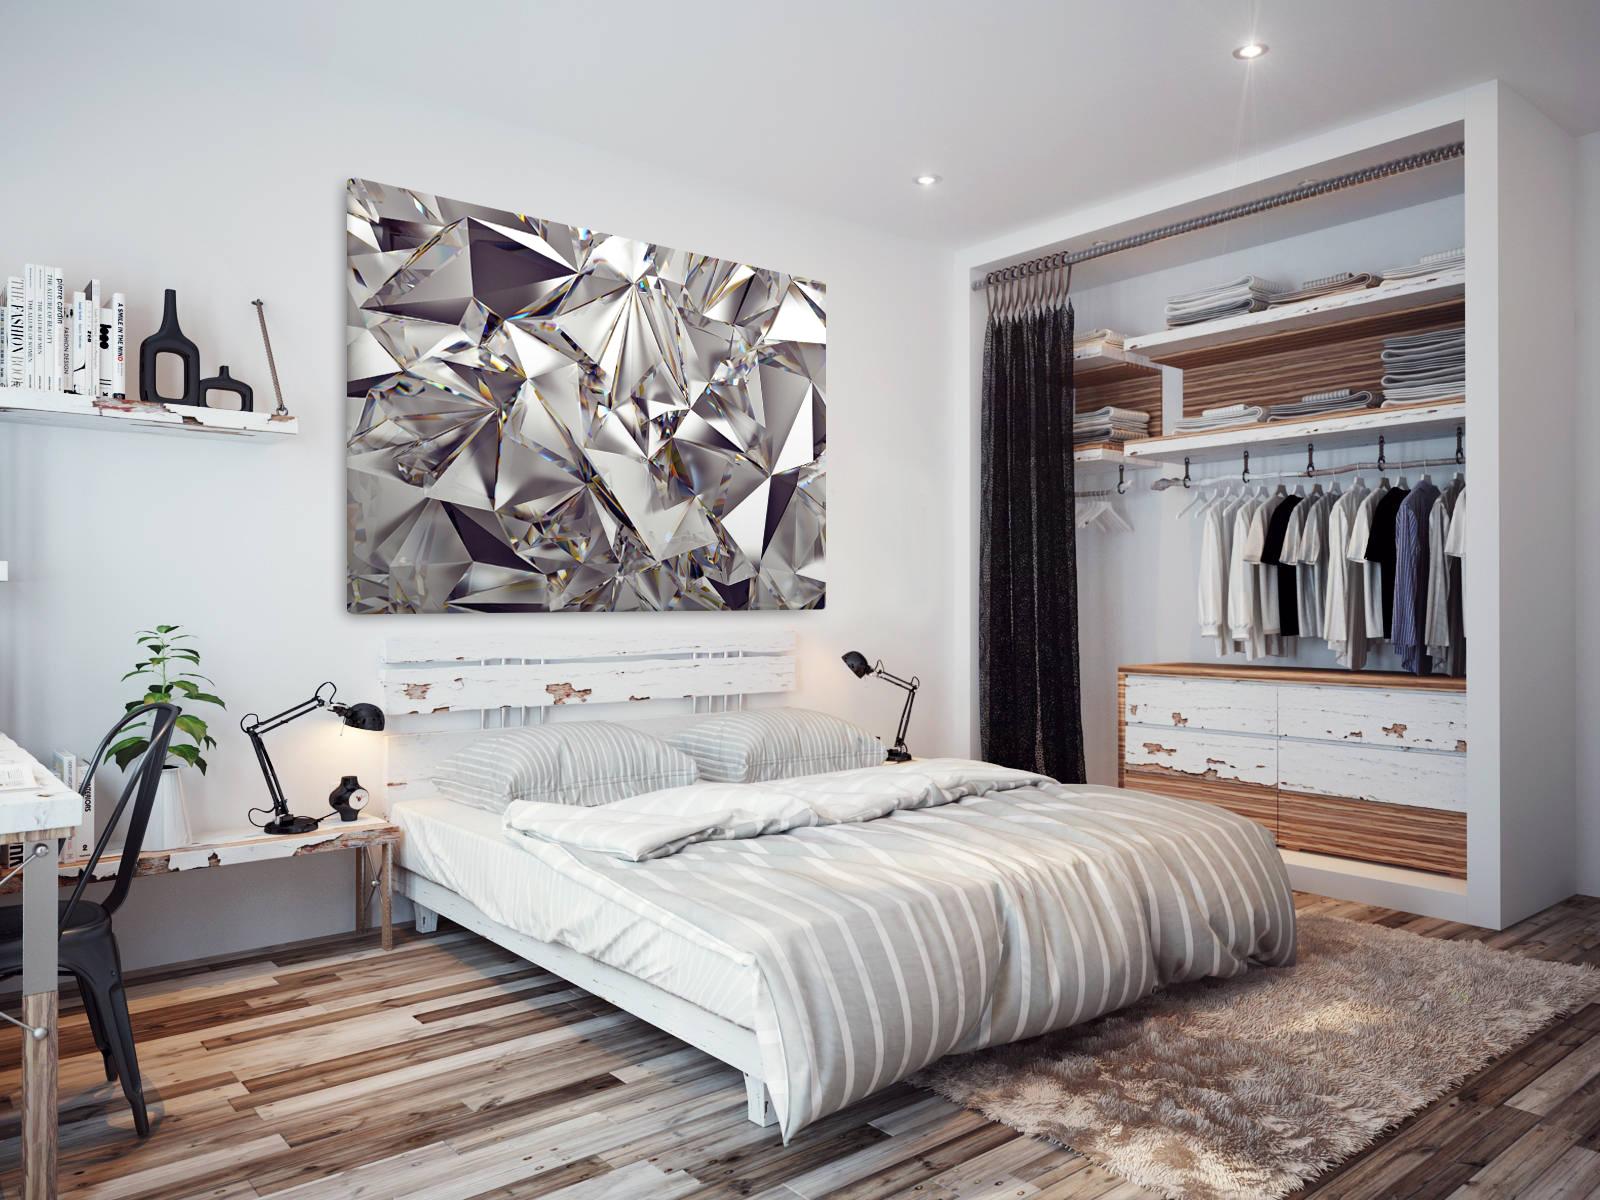 Ab1572 silver shiny diamond metal abstract wall art